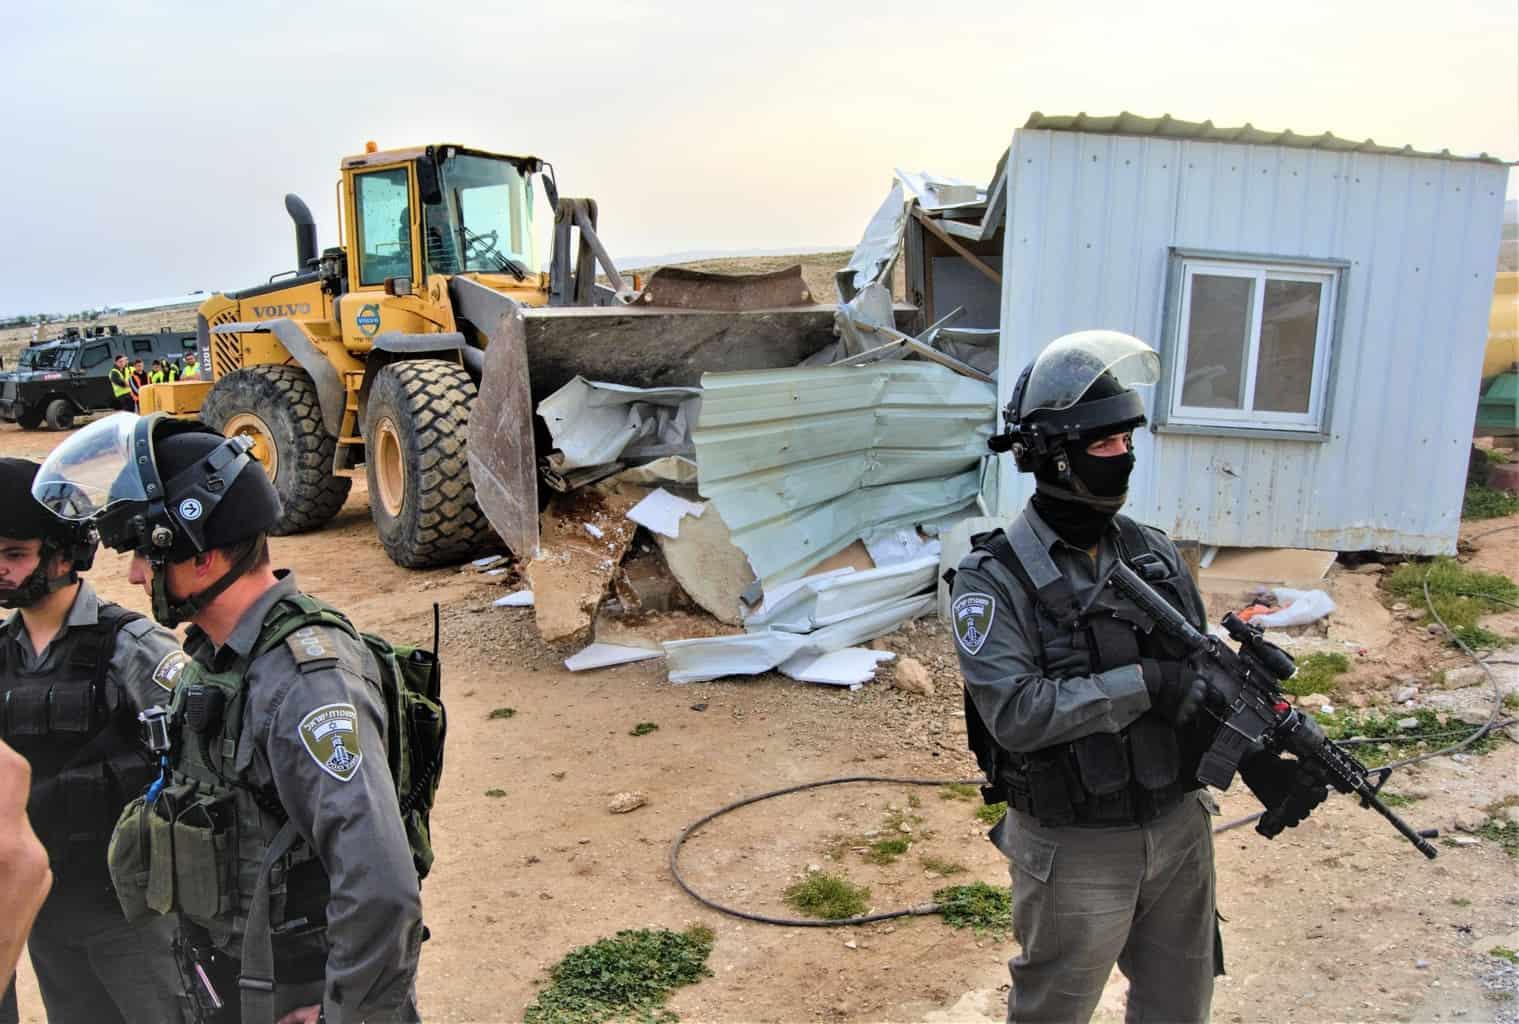 Israeli military incursion into Um al-Khair